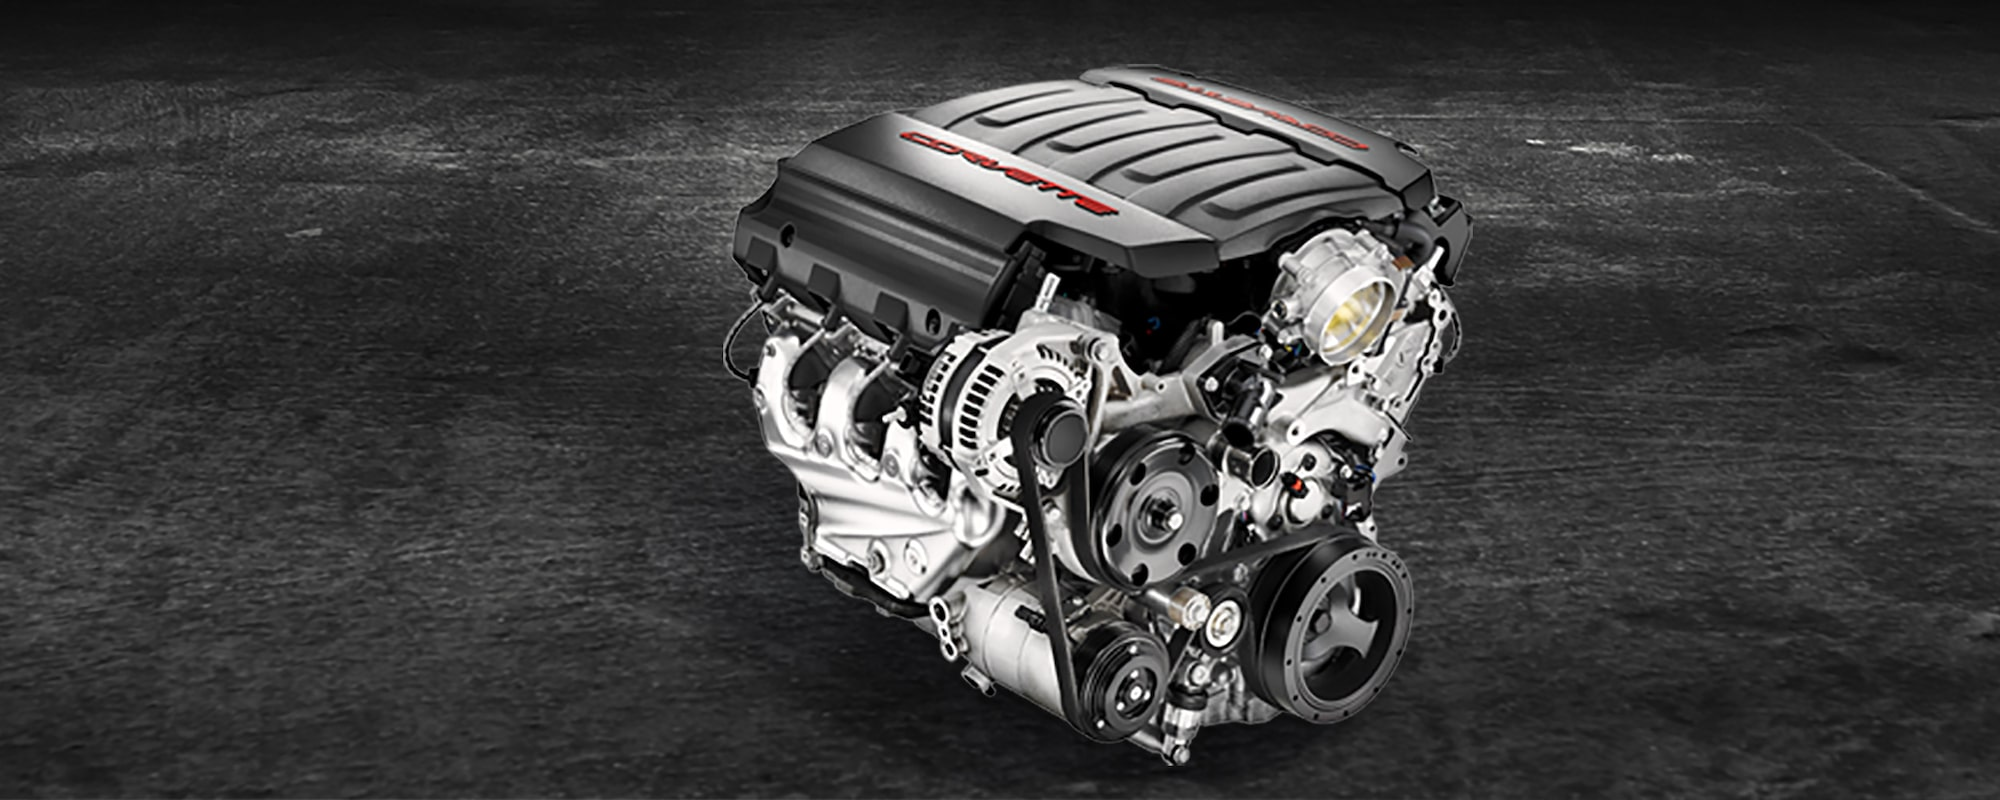 lt1 wet sump 6 2l small block crate engine chevrolet performance